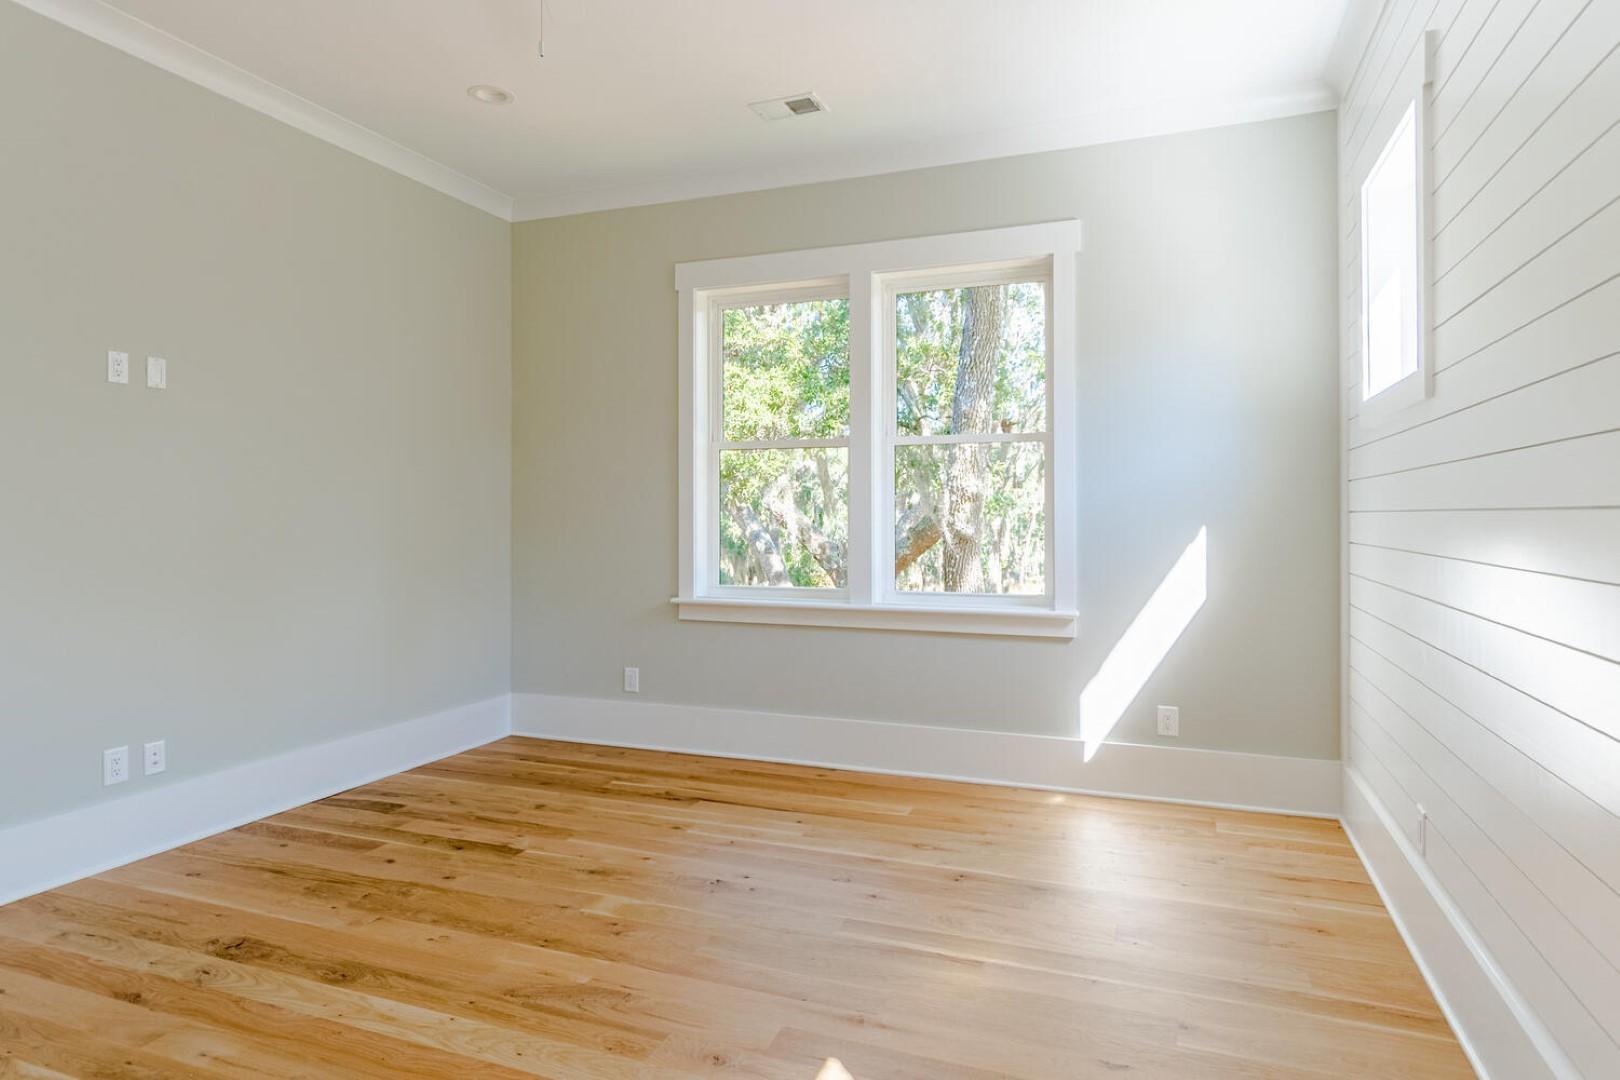 Scanlonville Homes For Sale - 156 5th, Mount Pleasant, SC - 9